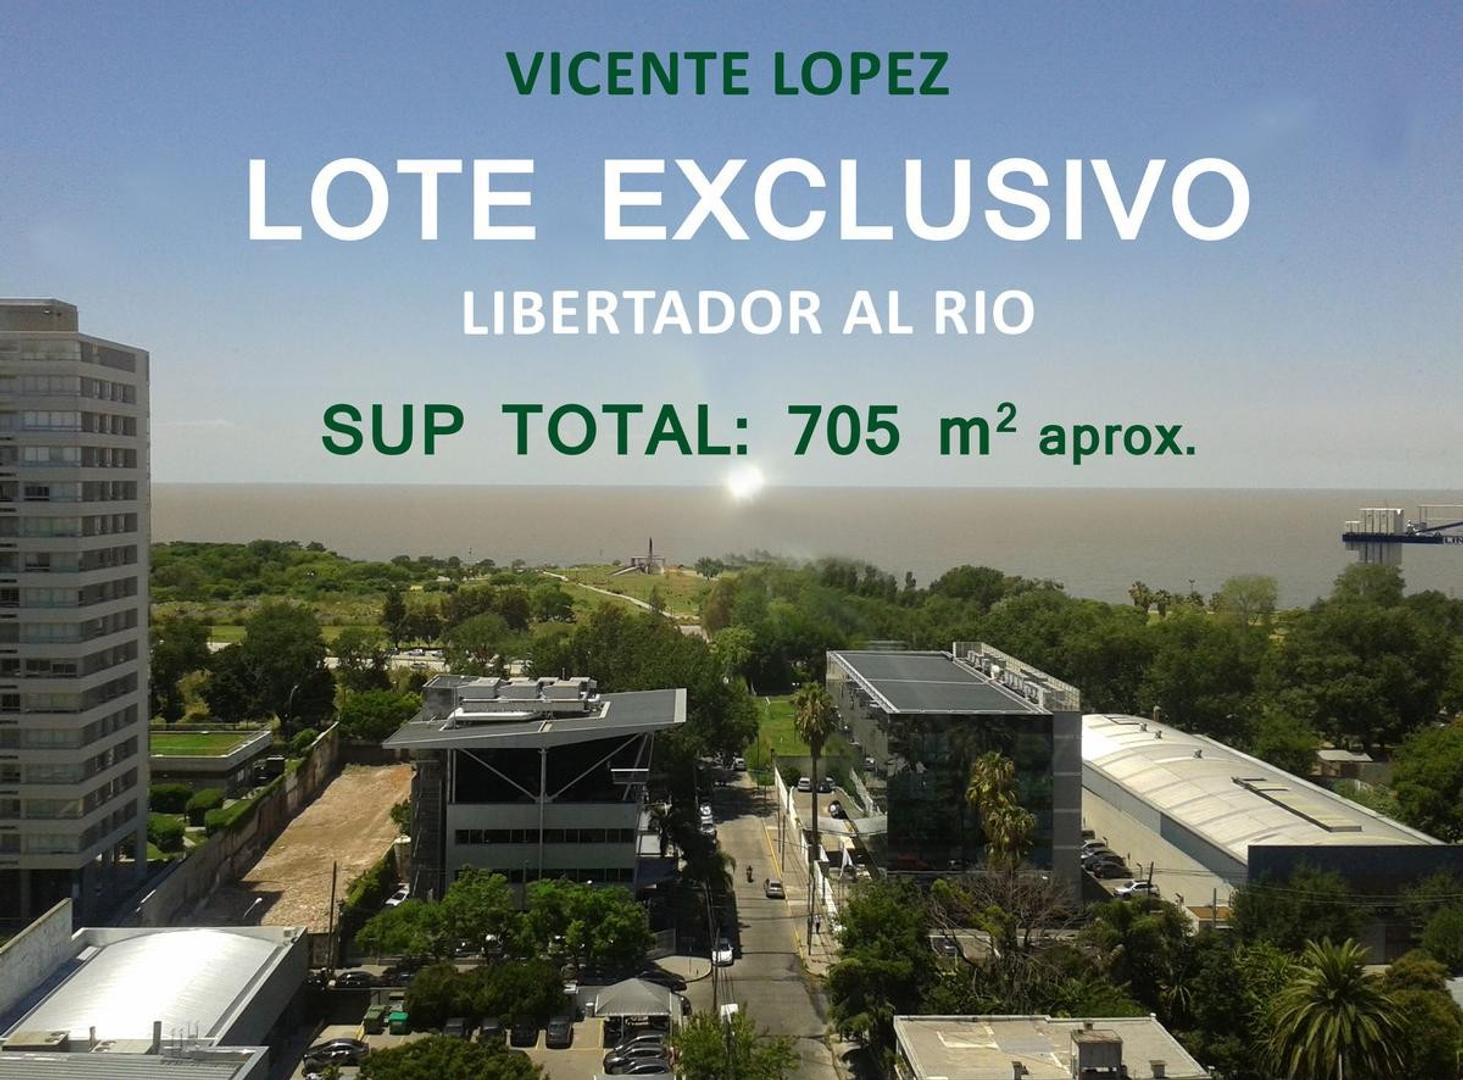 Terreno al rio - V.Lopez